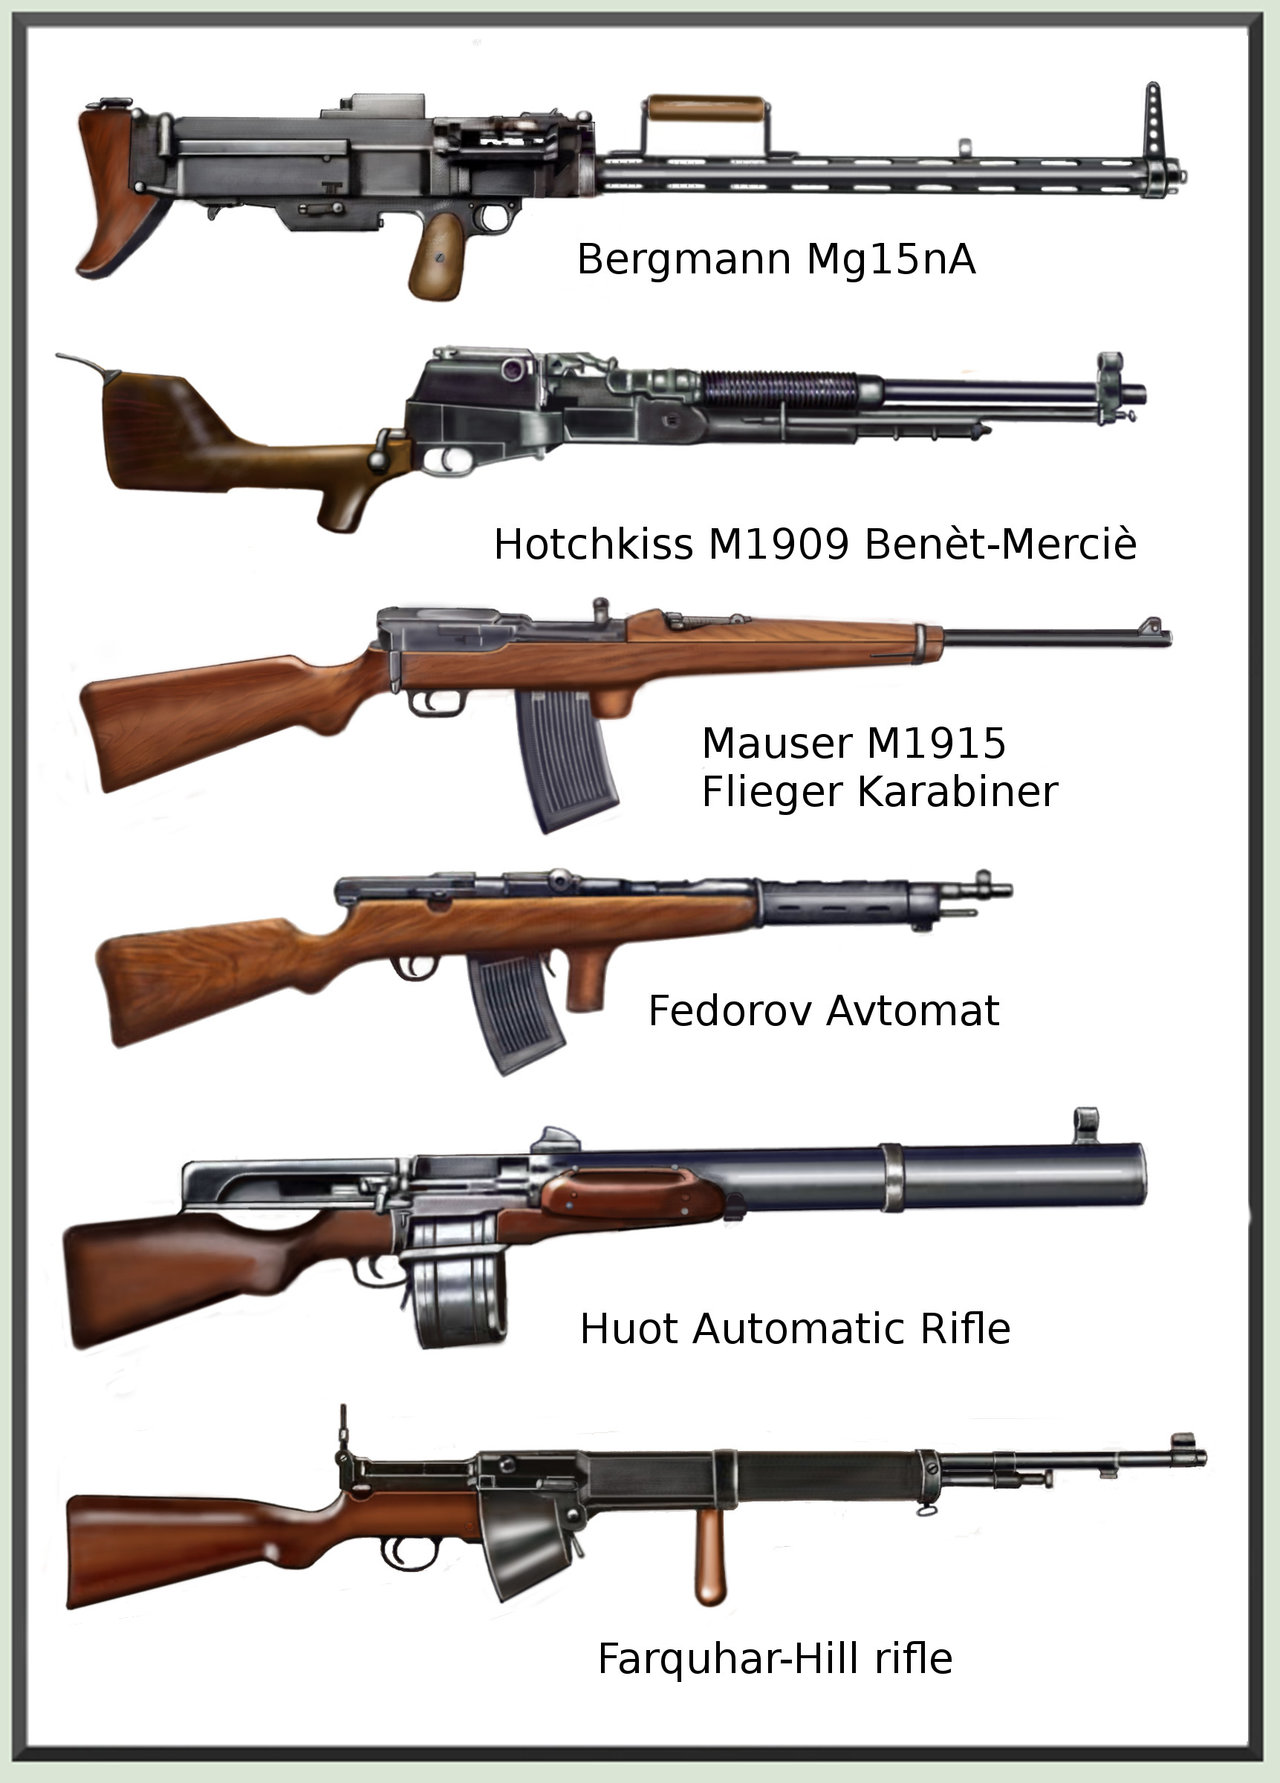 Drawn pistol ww1 gun Worldwar0ne AndreaSilva60 II Weapons